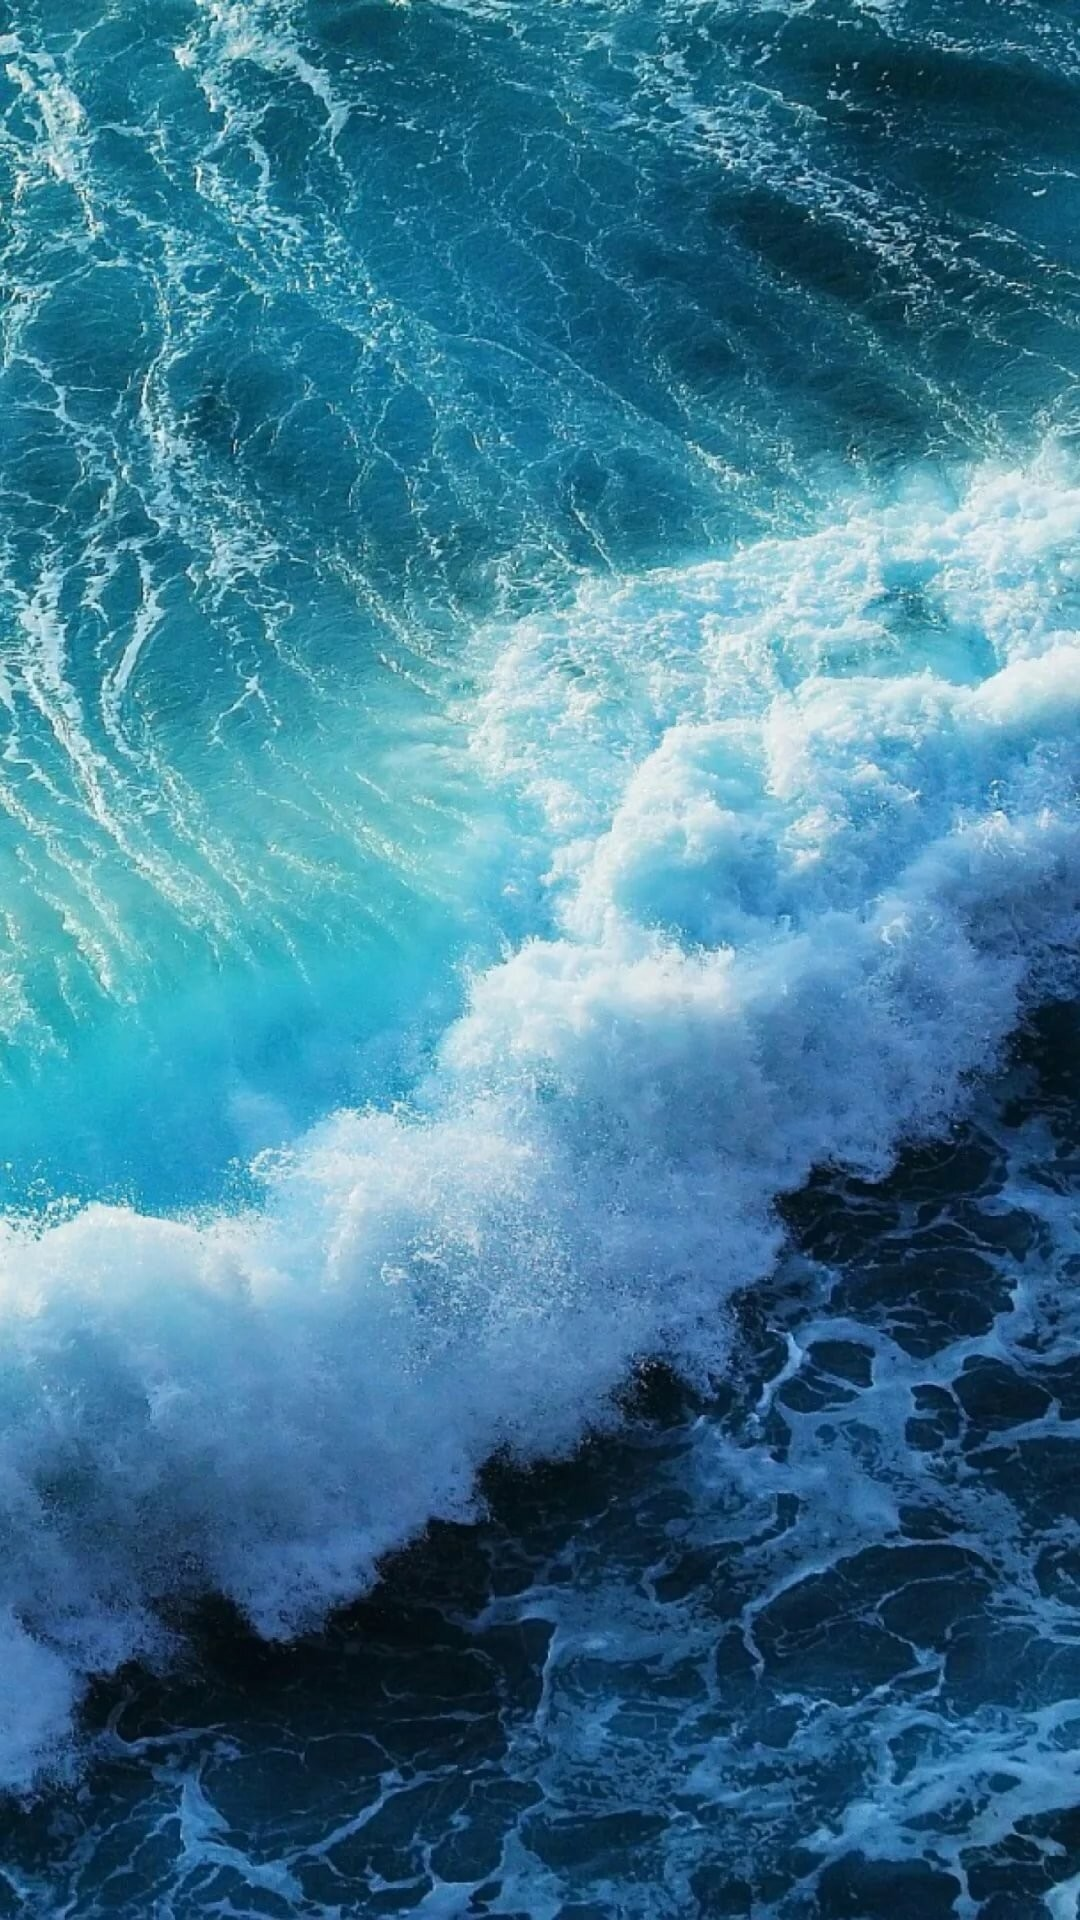 Wave hd wallpaper